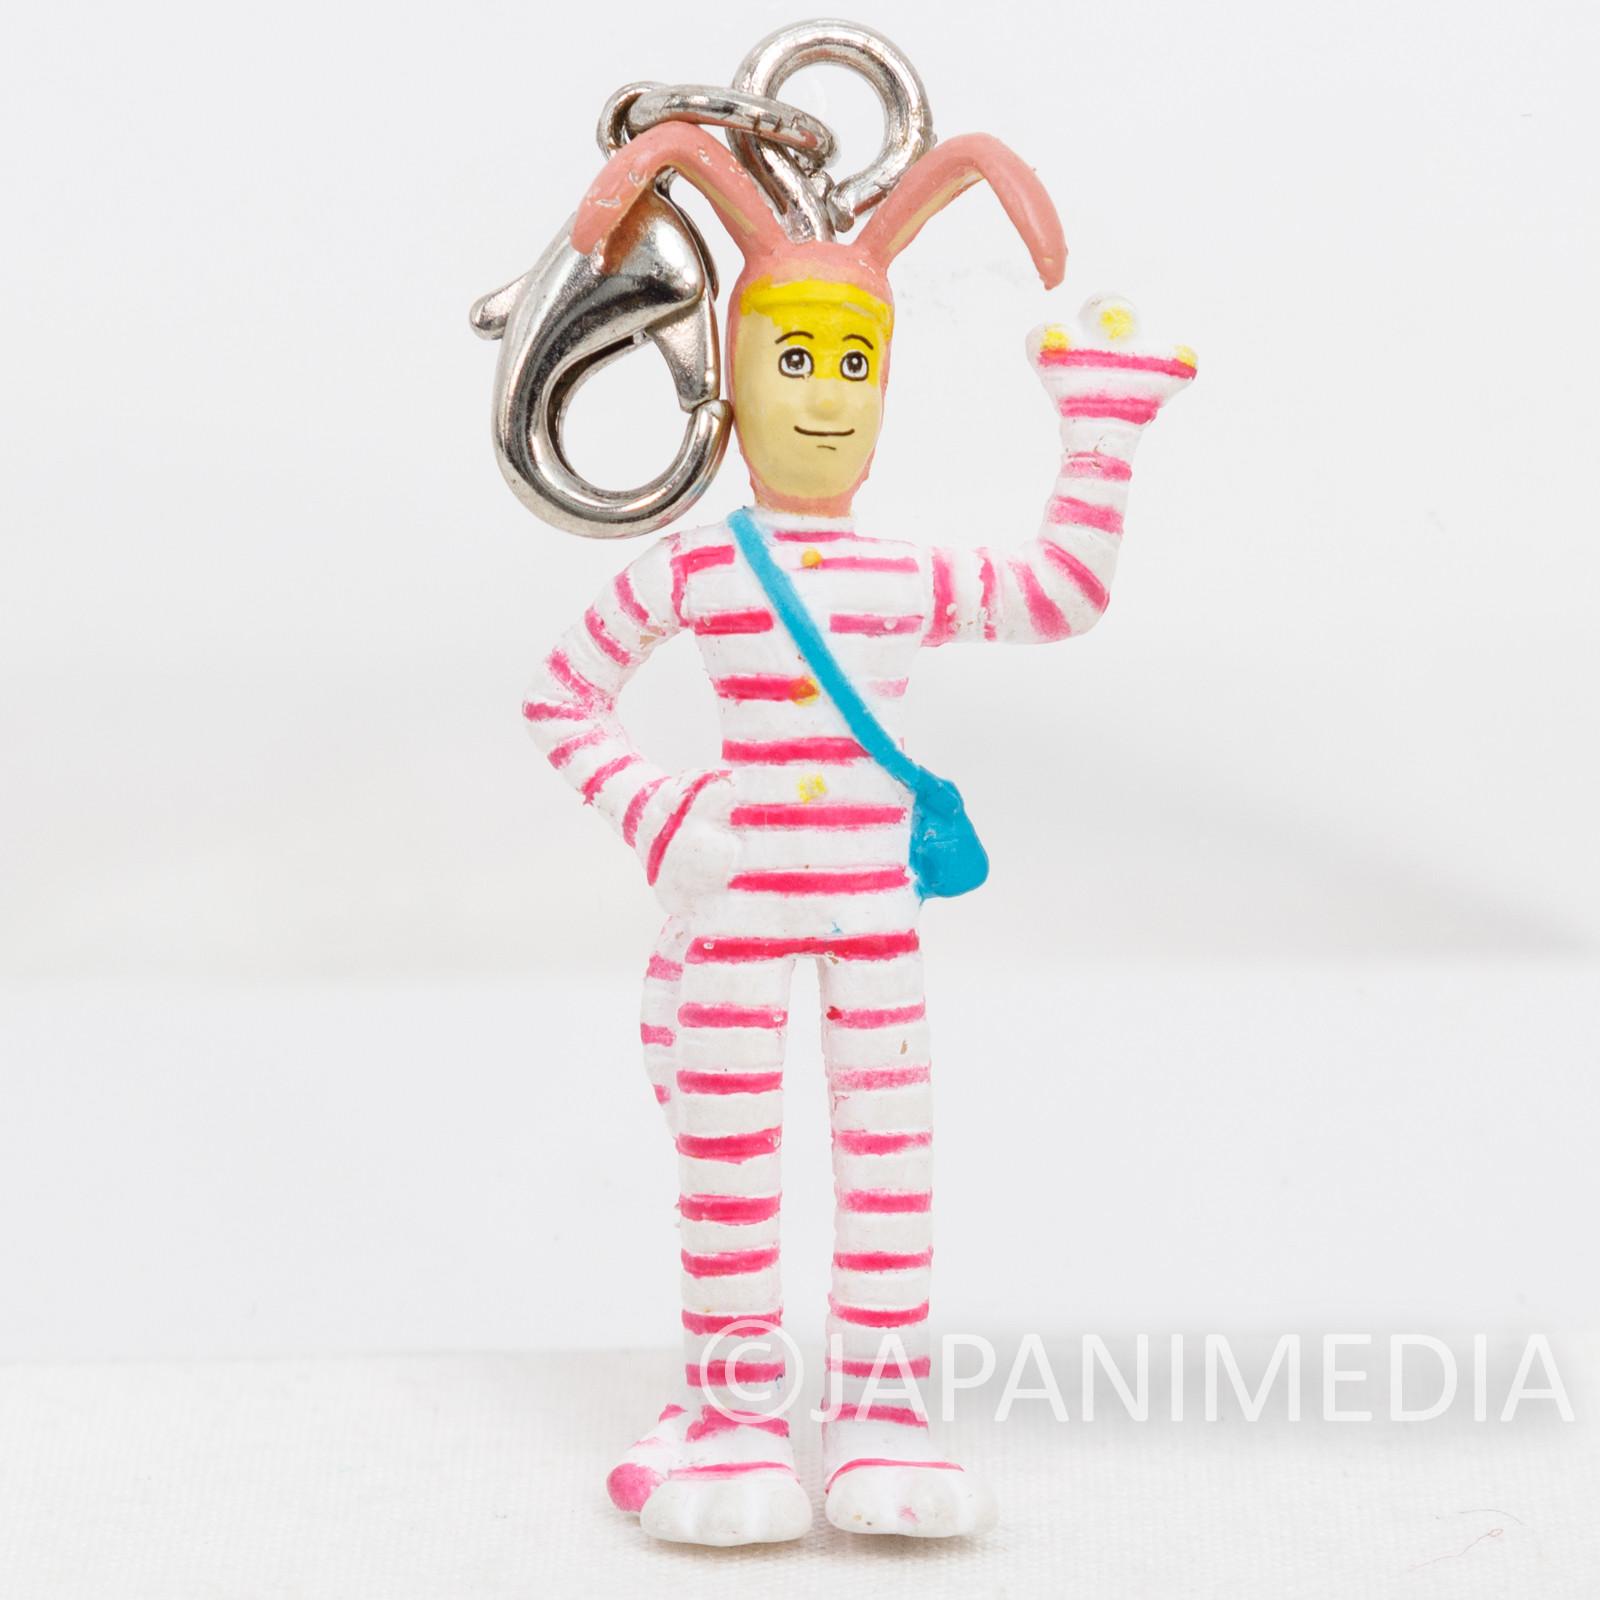 RARE! Popee the Performer Popee Minimum size Figure Mascot JAPAN ANIME MANGA